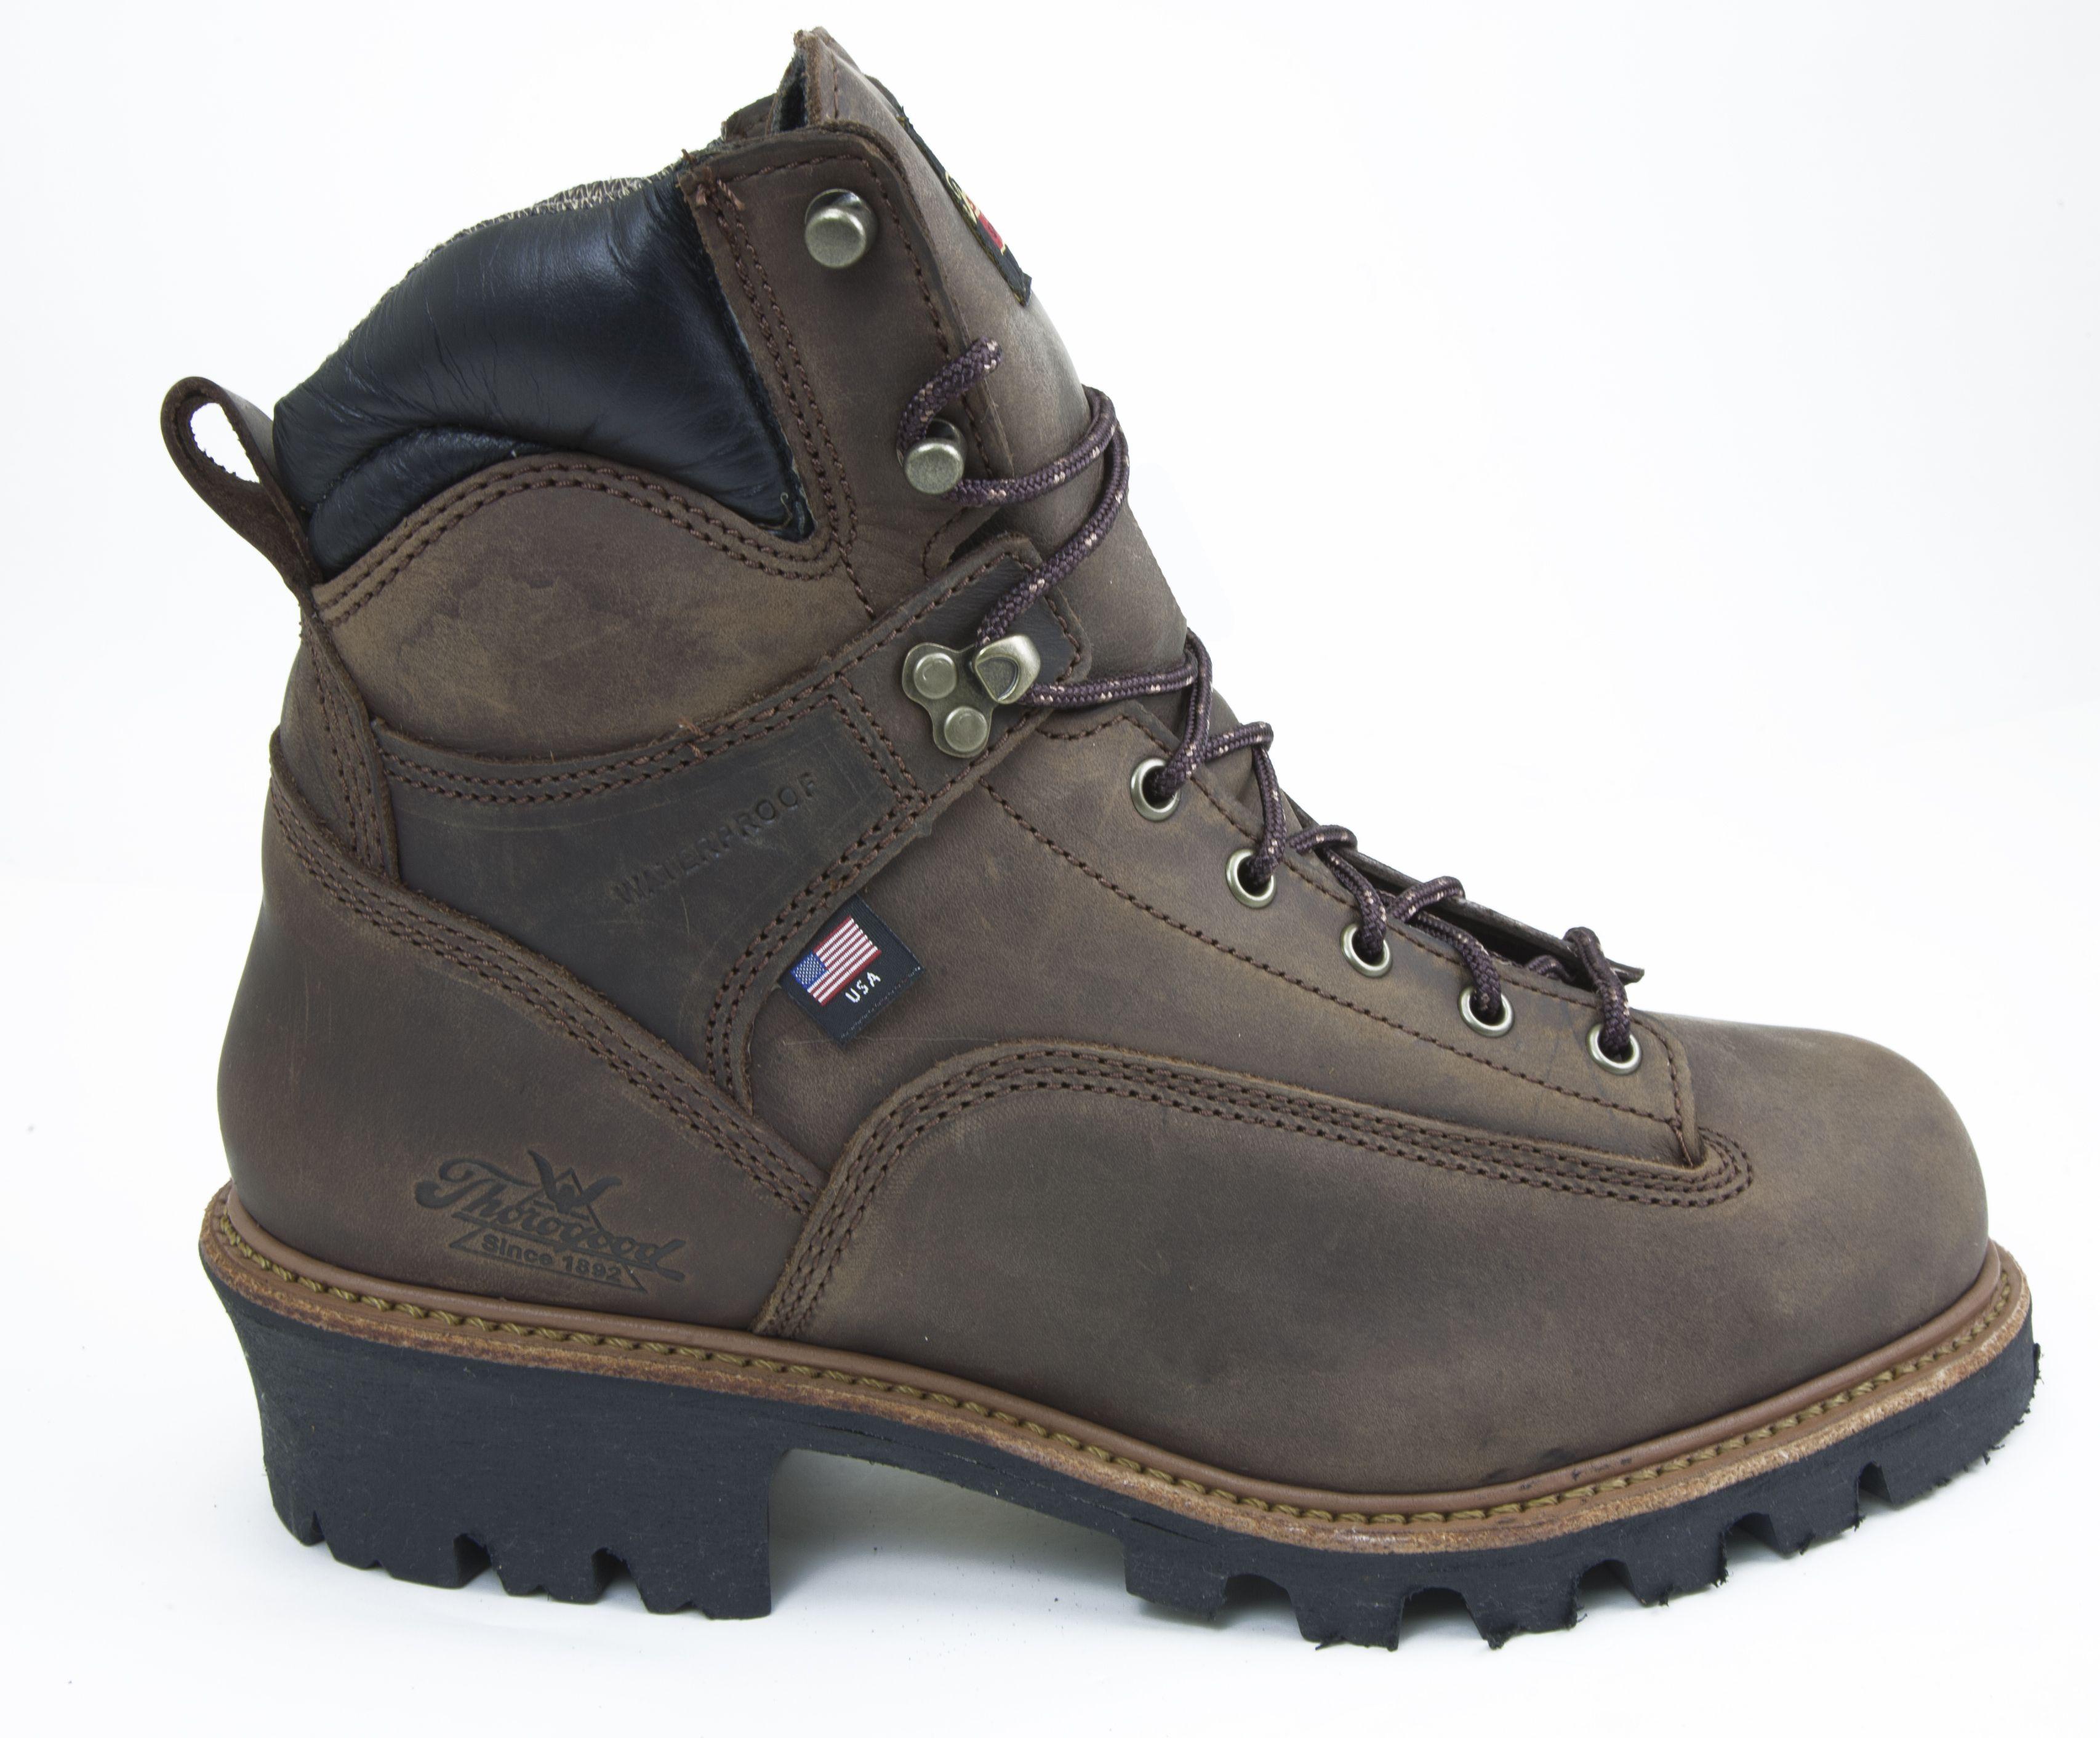 Waterproof Steel Toe Boots Made In Usa in 2020